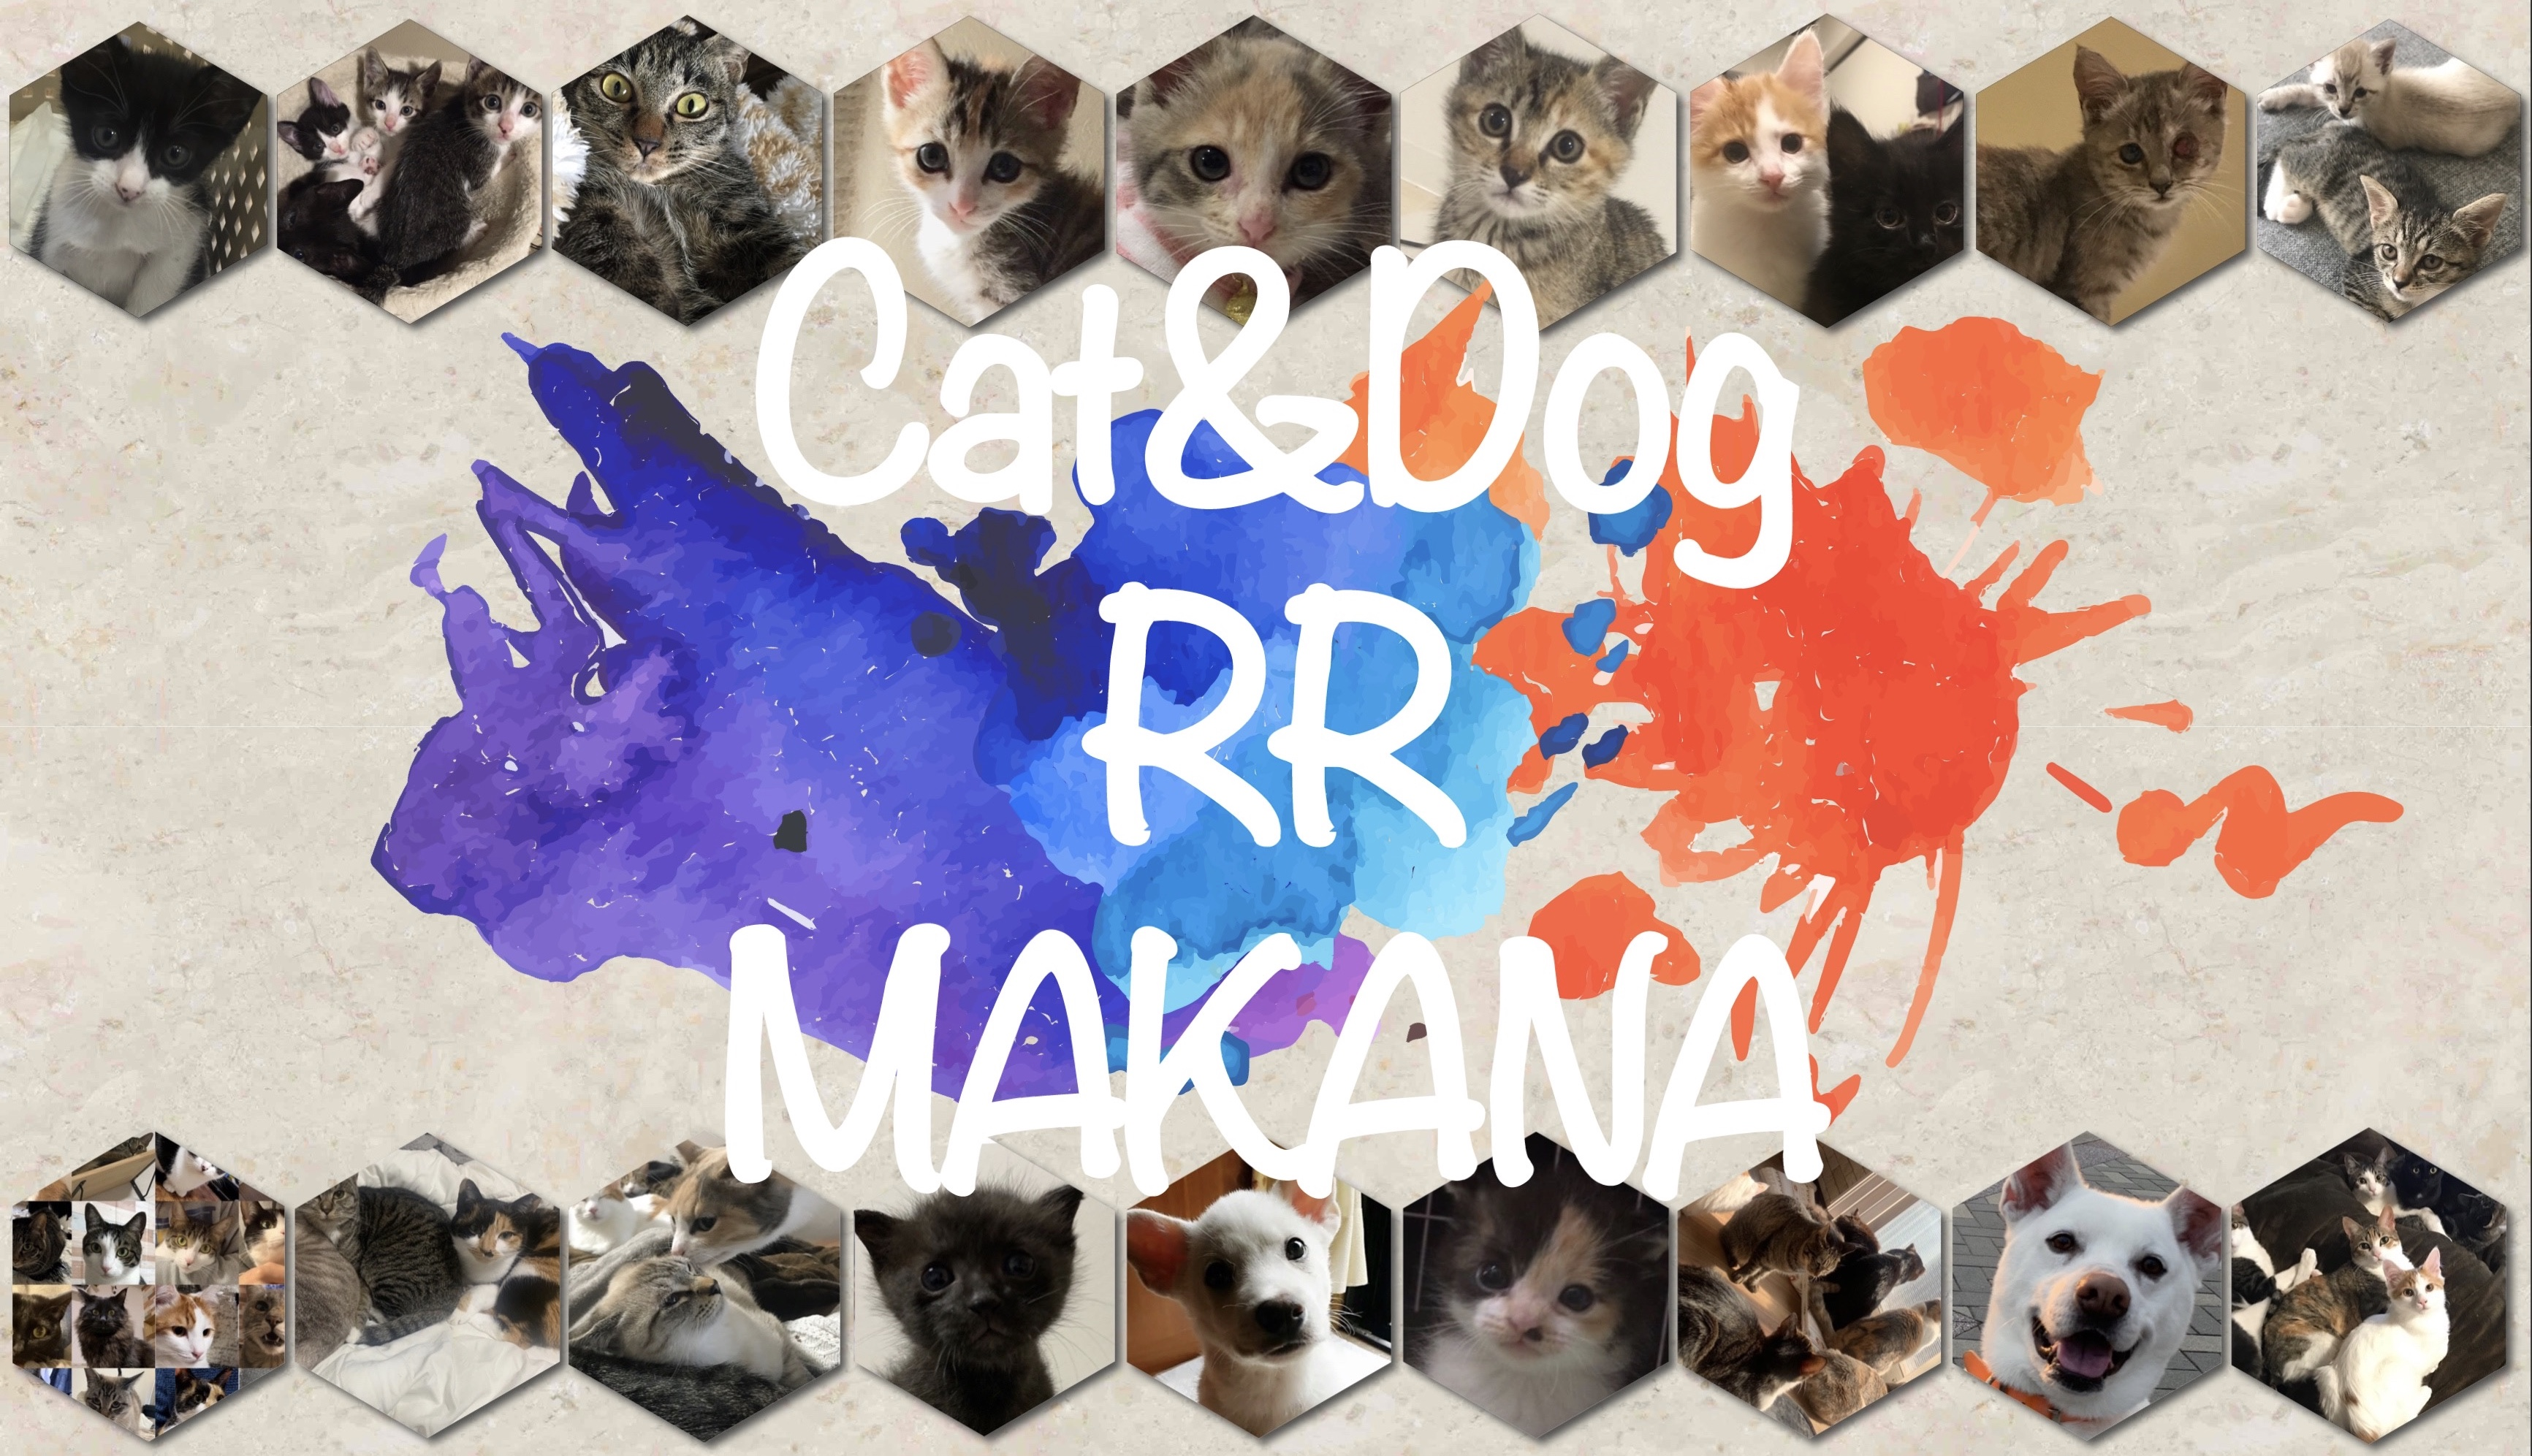 Cat&Dog RR MAKANA